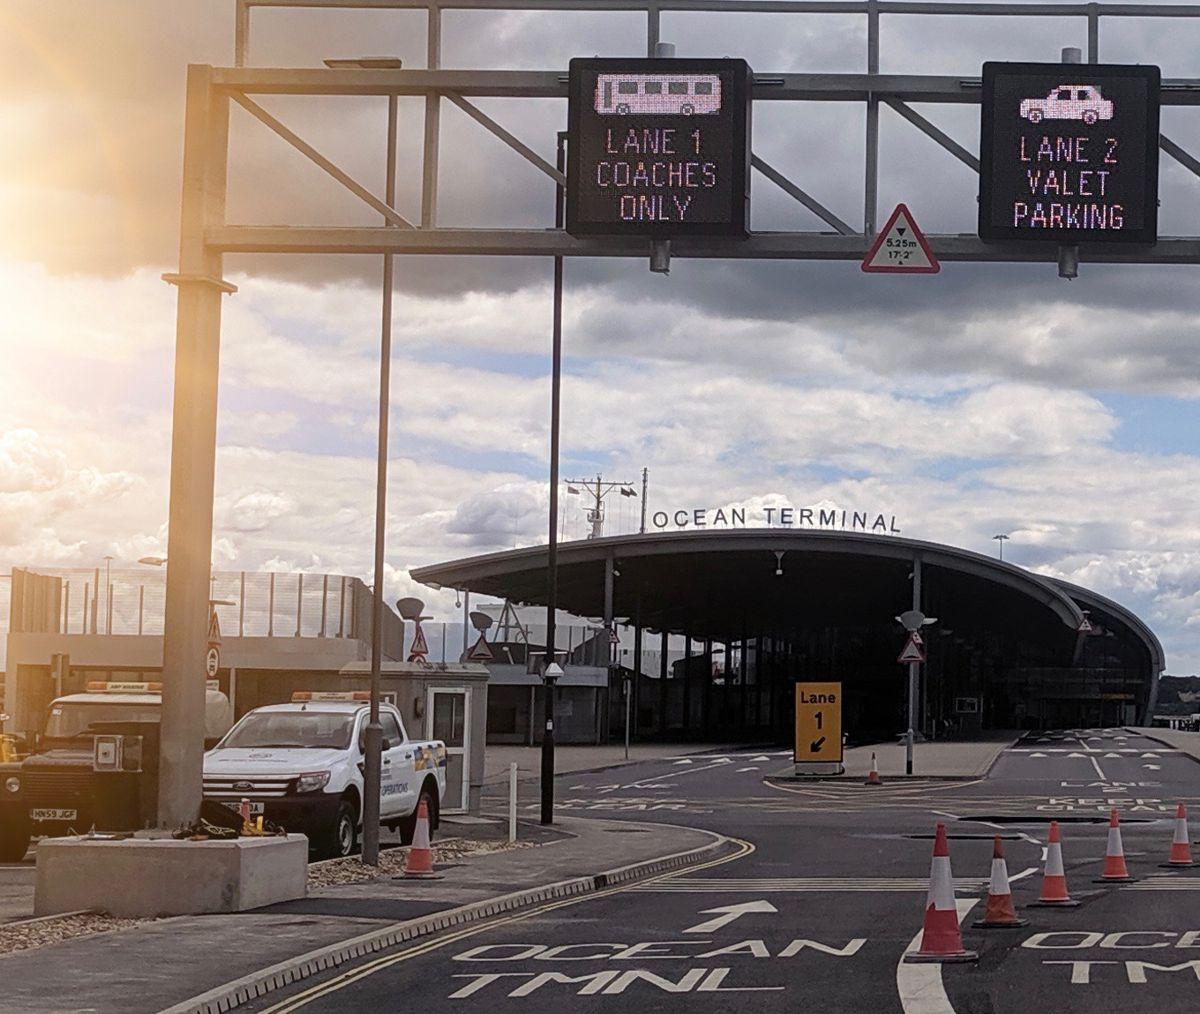 SWARCO Traffic helps ease traffic flow at the Southampton Ocean Cruise Terminal